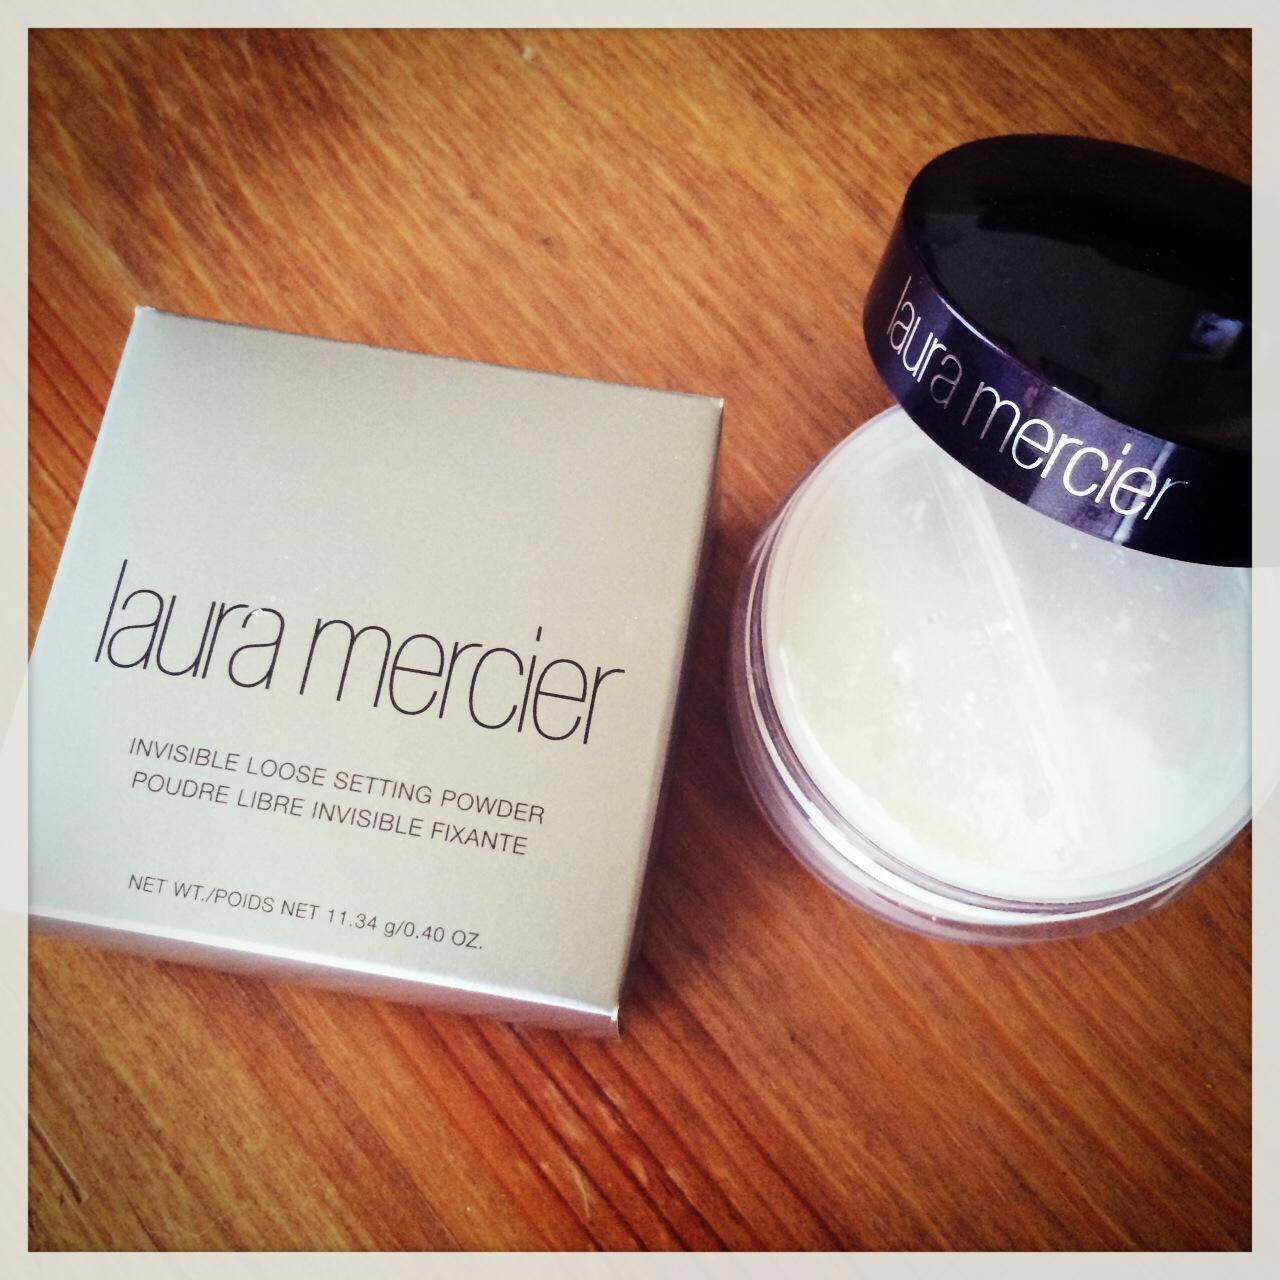 Review Laura Mercier Invisible Loose Setting Powder